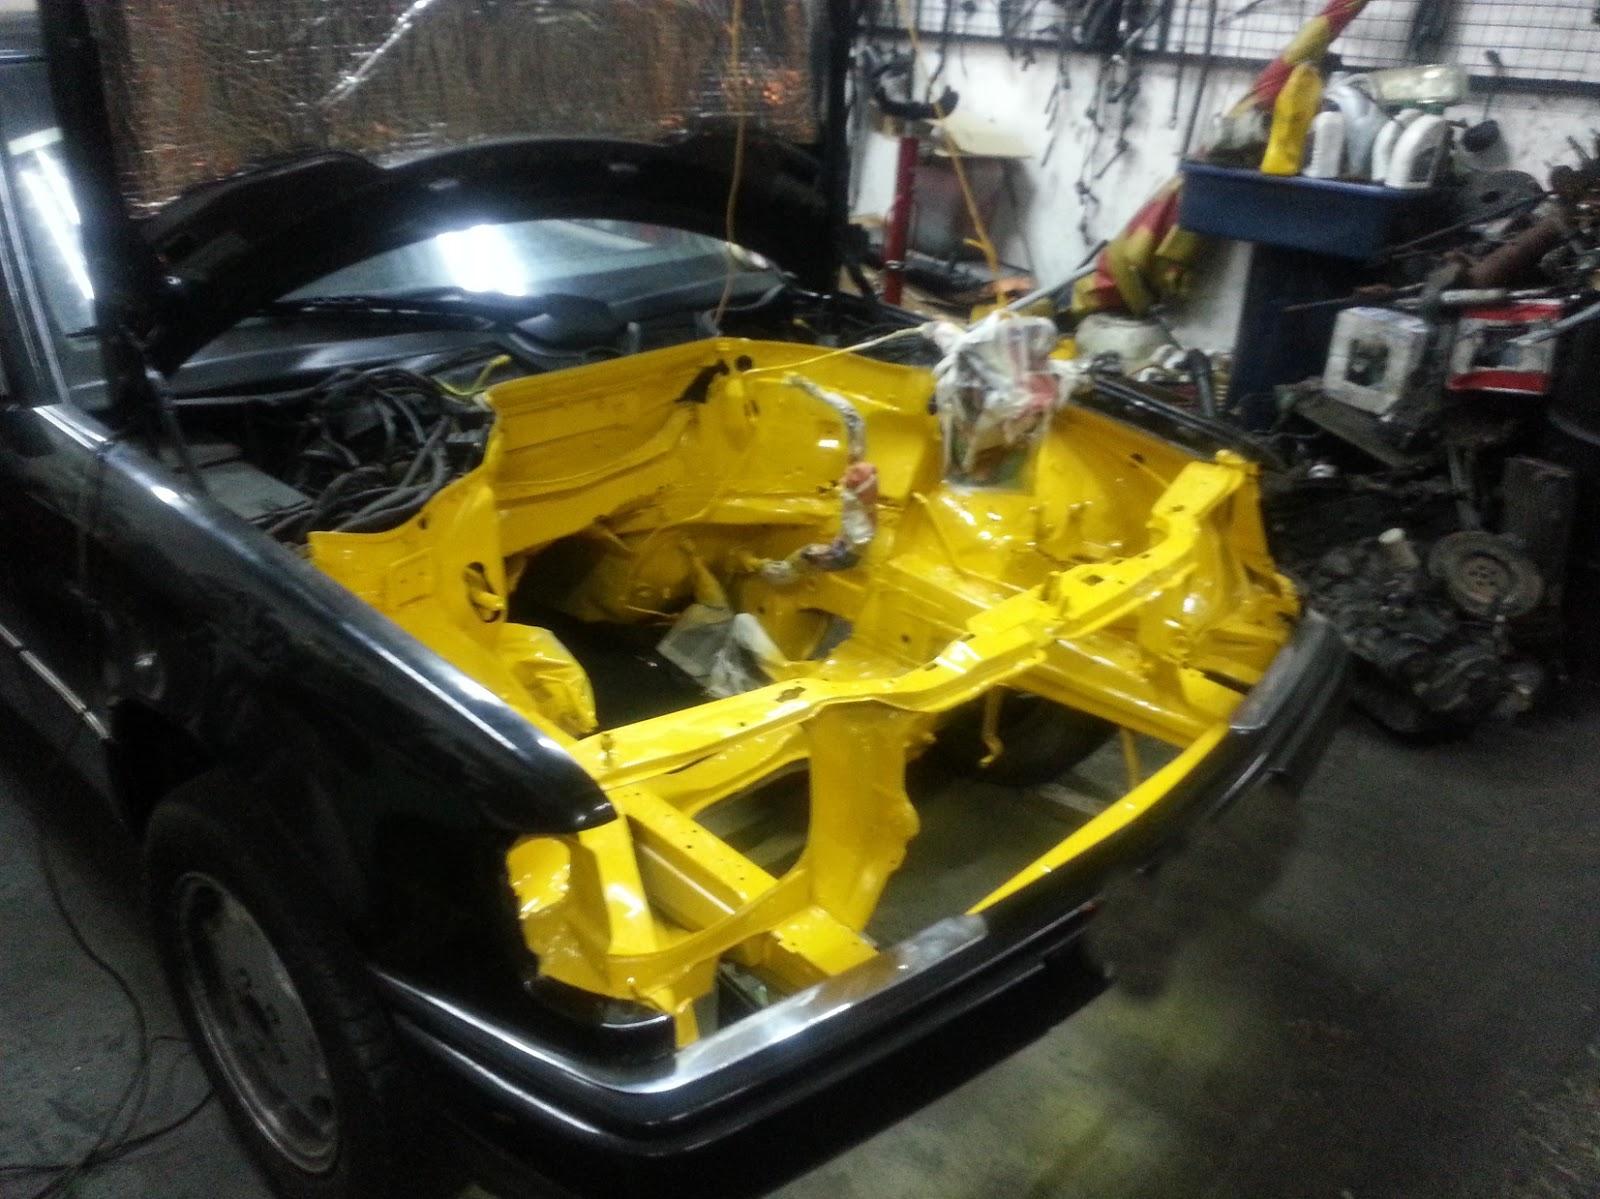 1jz Gte Vvti W124 Yellow Painted Engine Bay